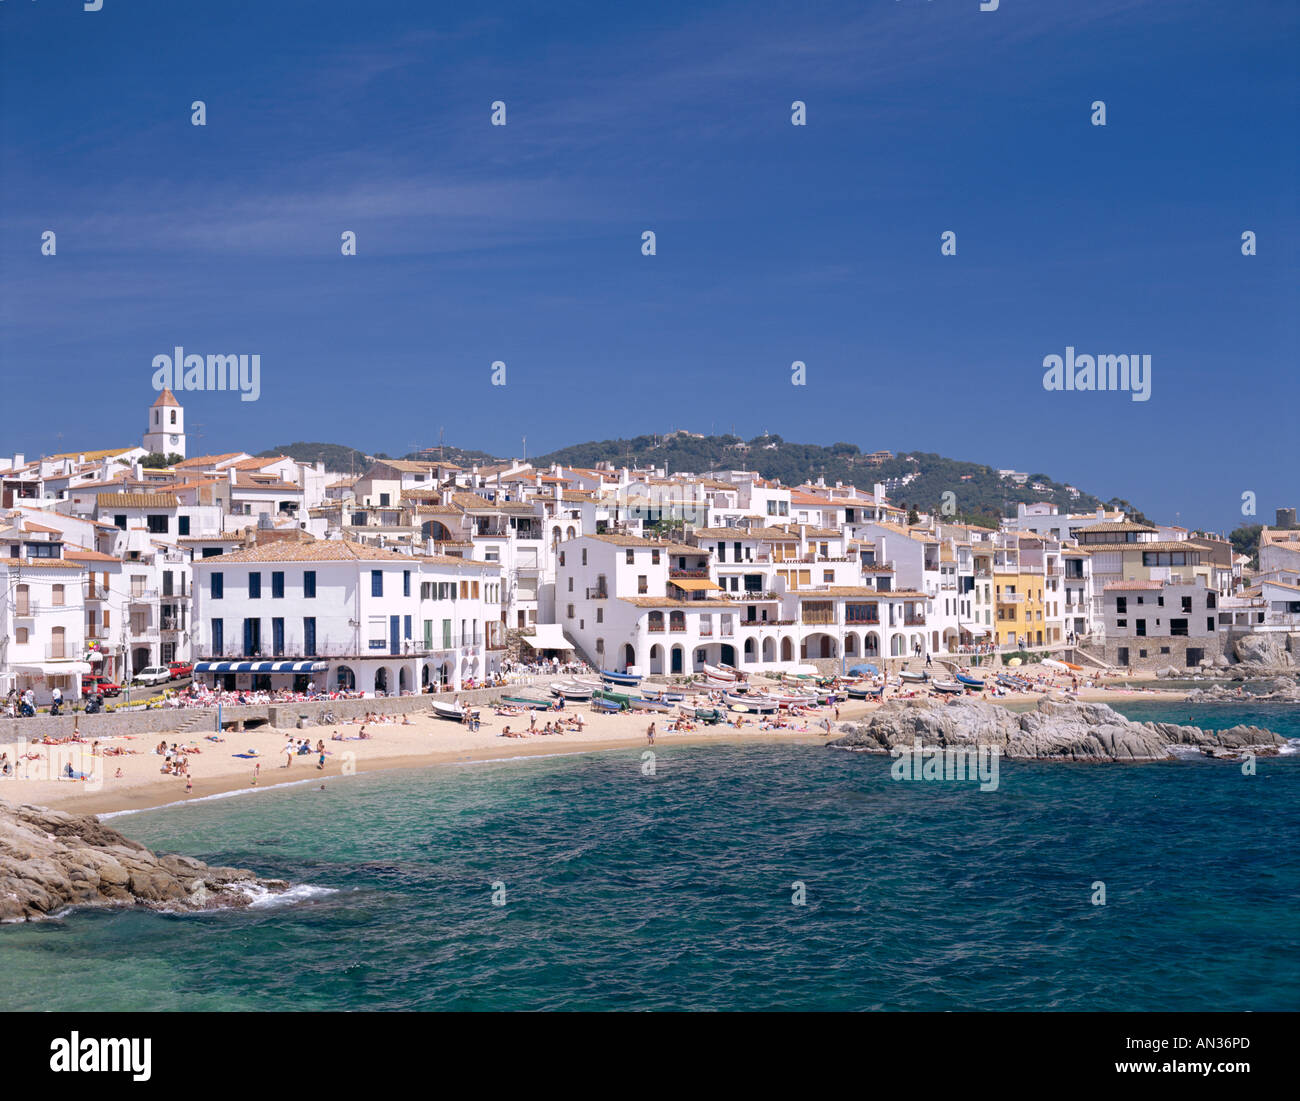 Die Costa Brava, Katalonien, in Calella de Palafrugell, Spanien Stockbild